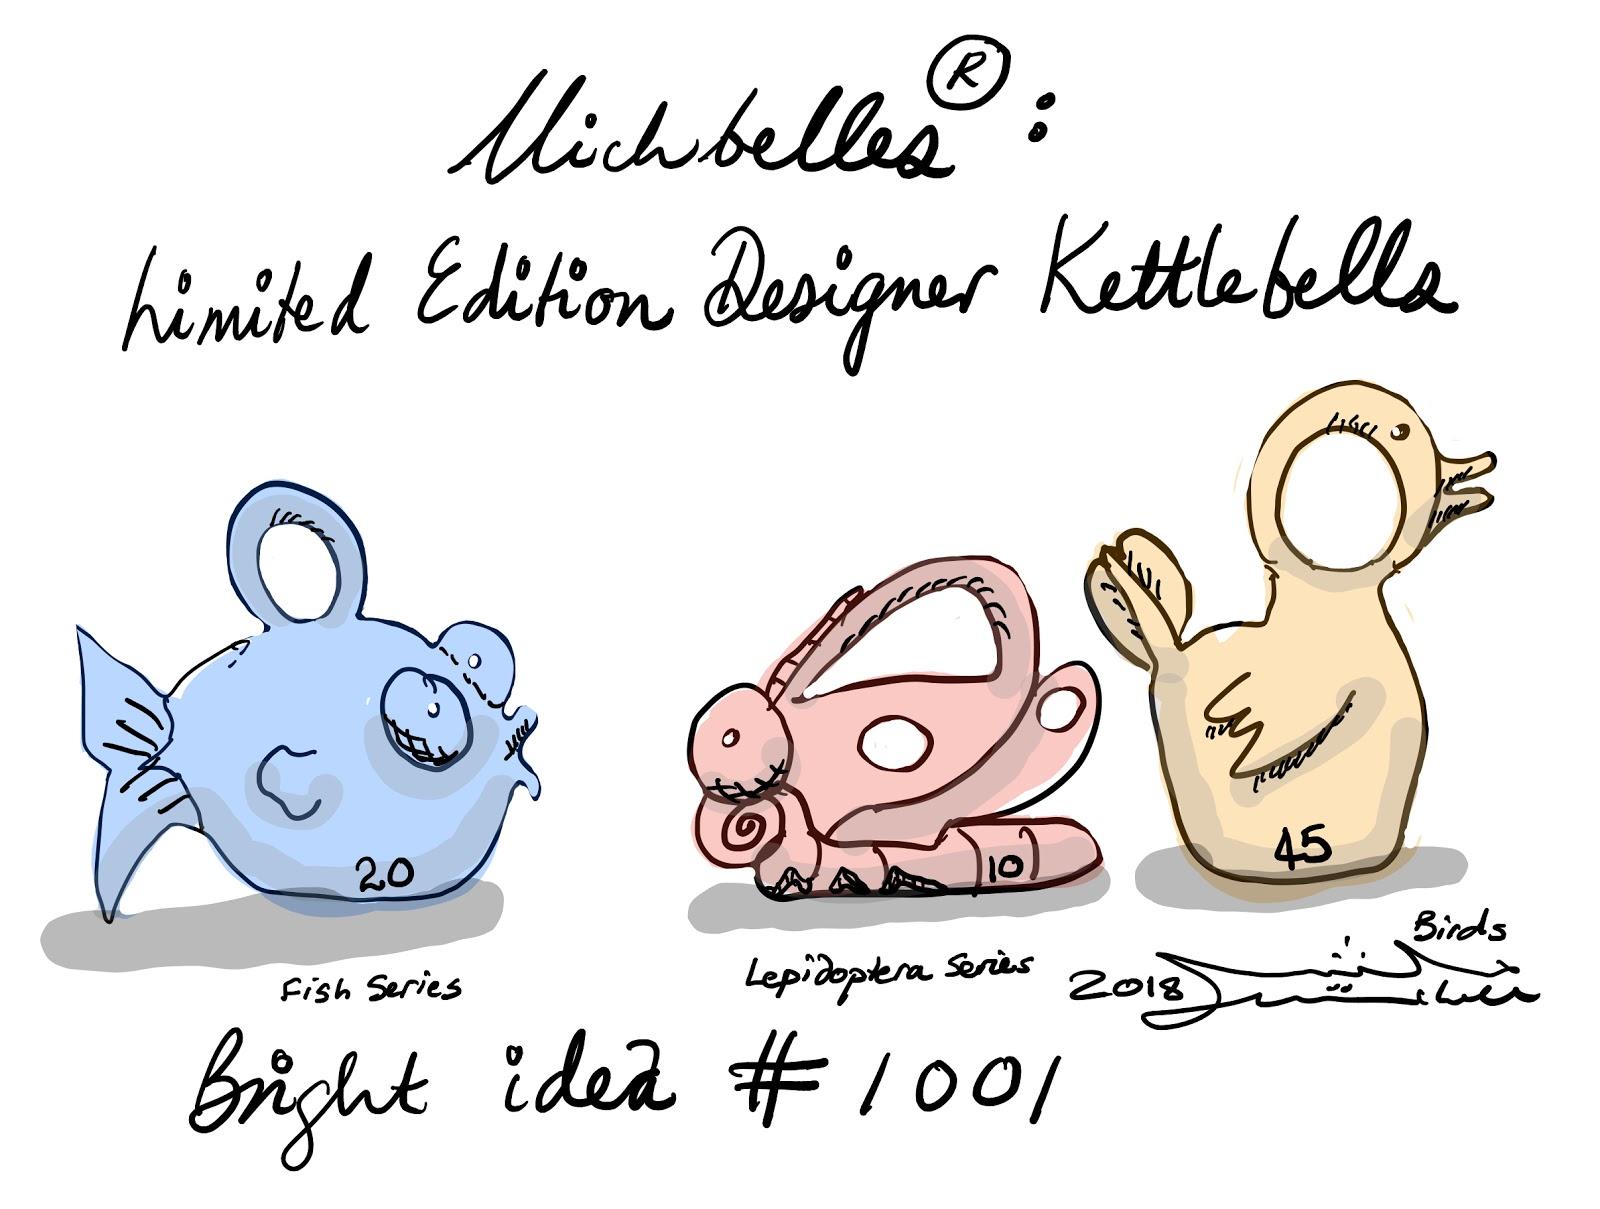 Michbelles